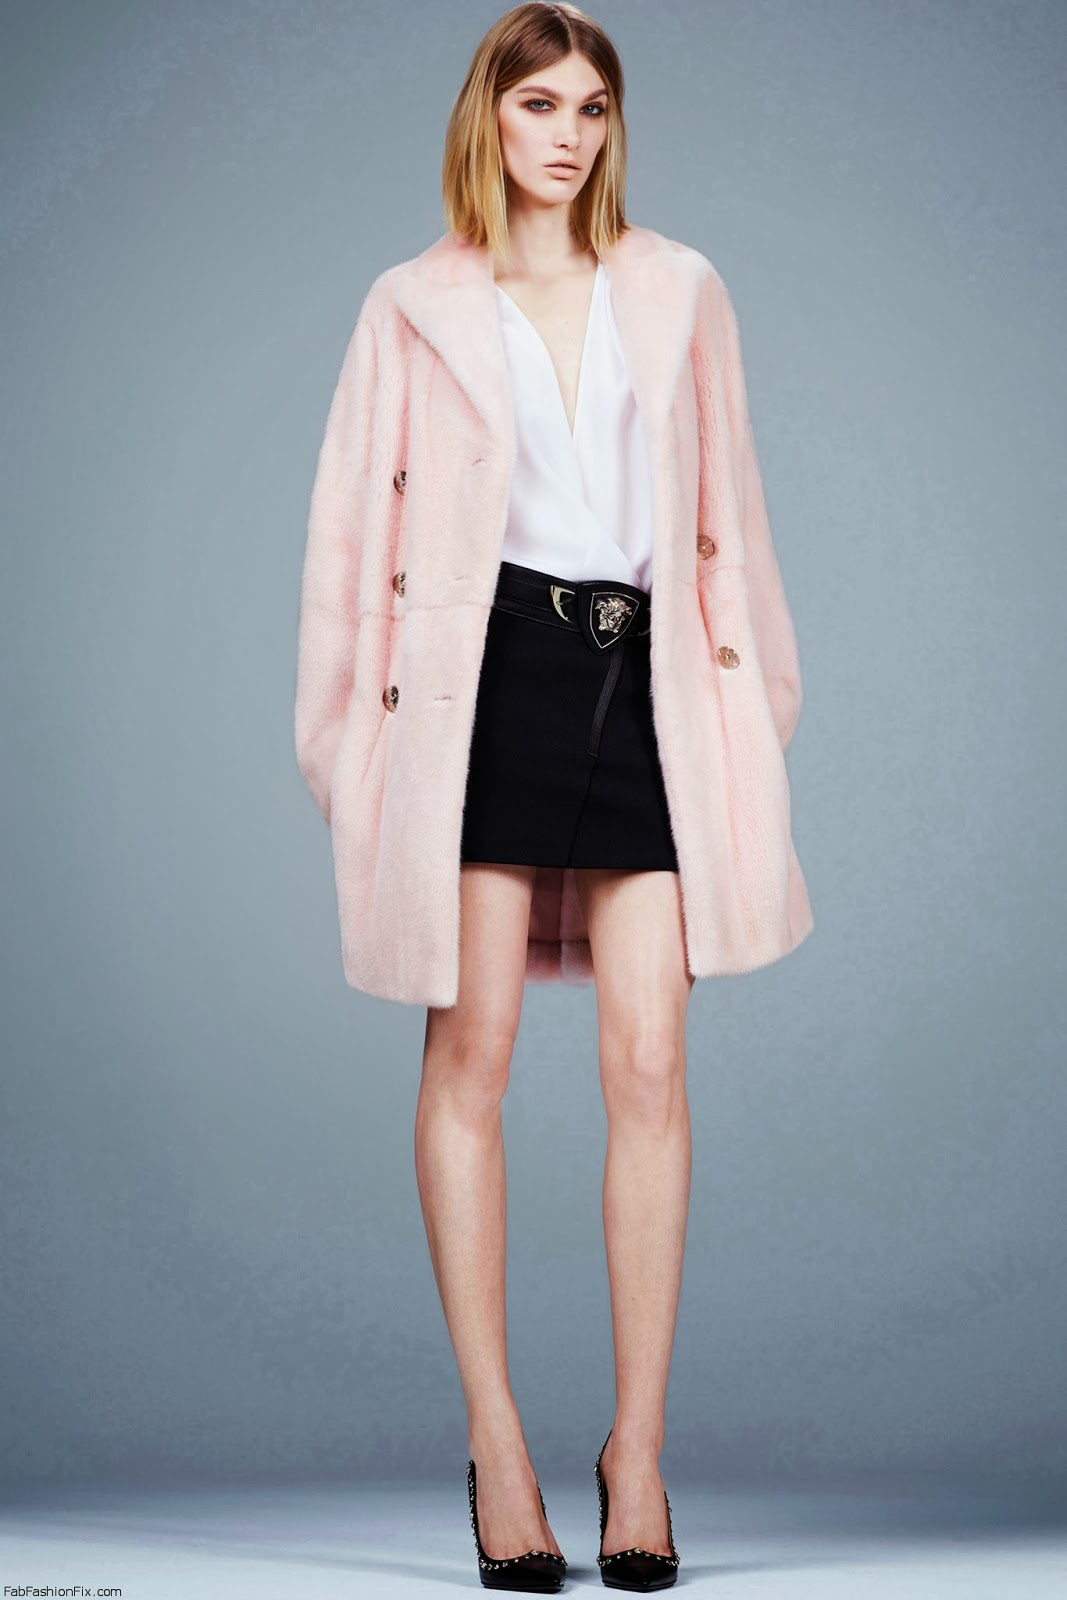 black-mini-skirt-white-top-blouse-pink-light-jacket-coat-howtowear-fashion-style-outfit-fall-winter-basic-black-shoe-pumps-versace-designer-blonde-dinner.jpg